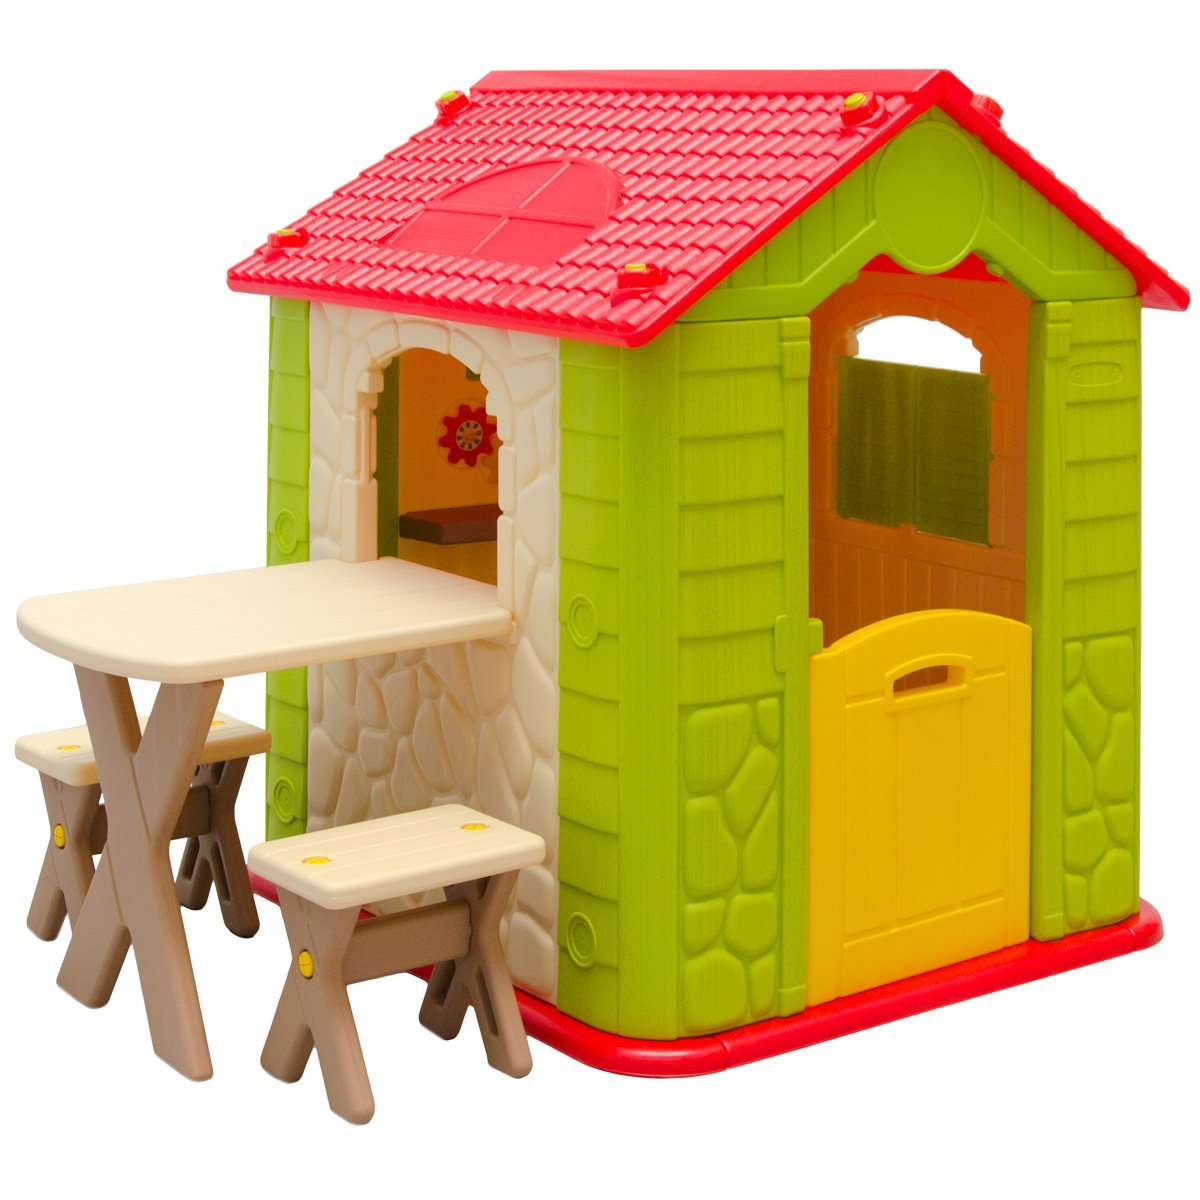 Smoby Pretty Haus Alle Infos Auf 1 Blick